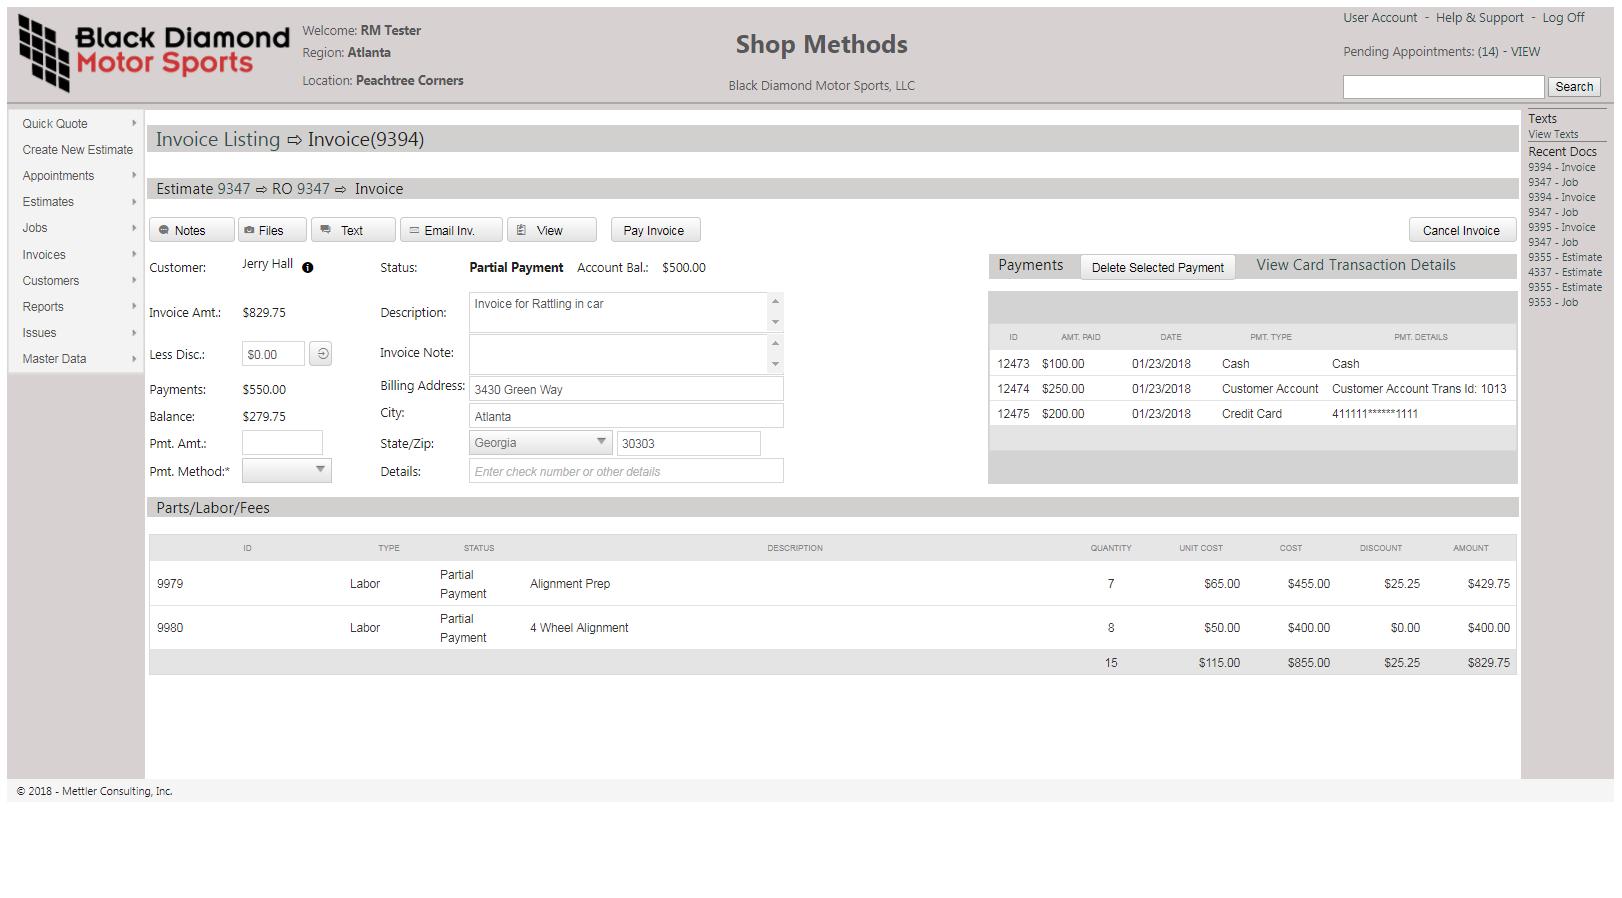 Invoice listings